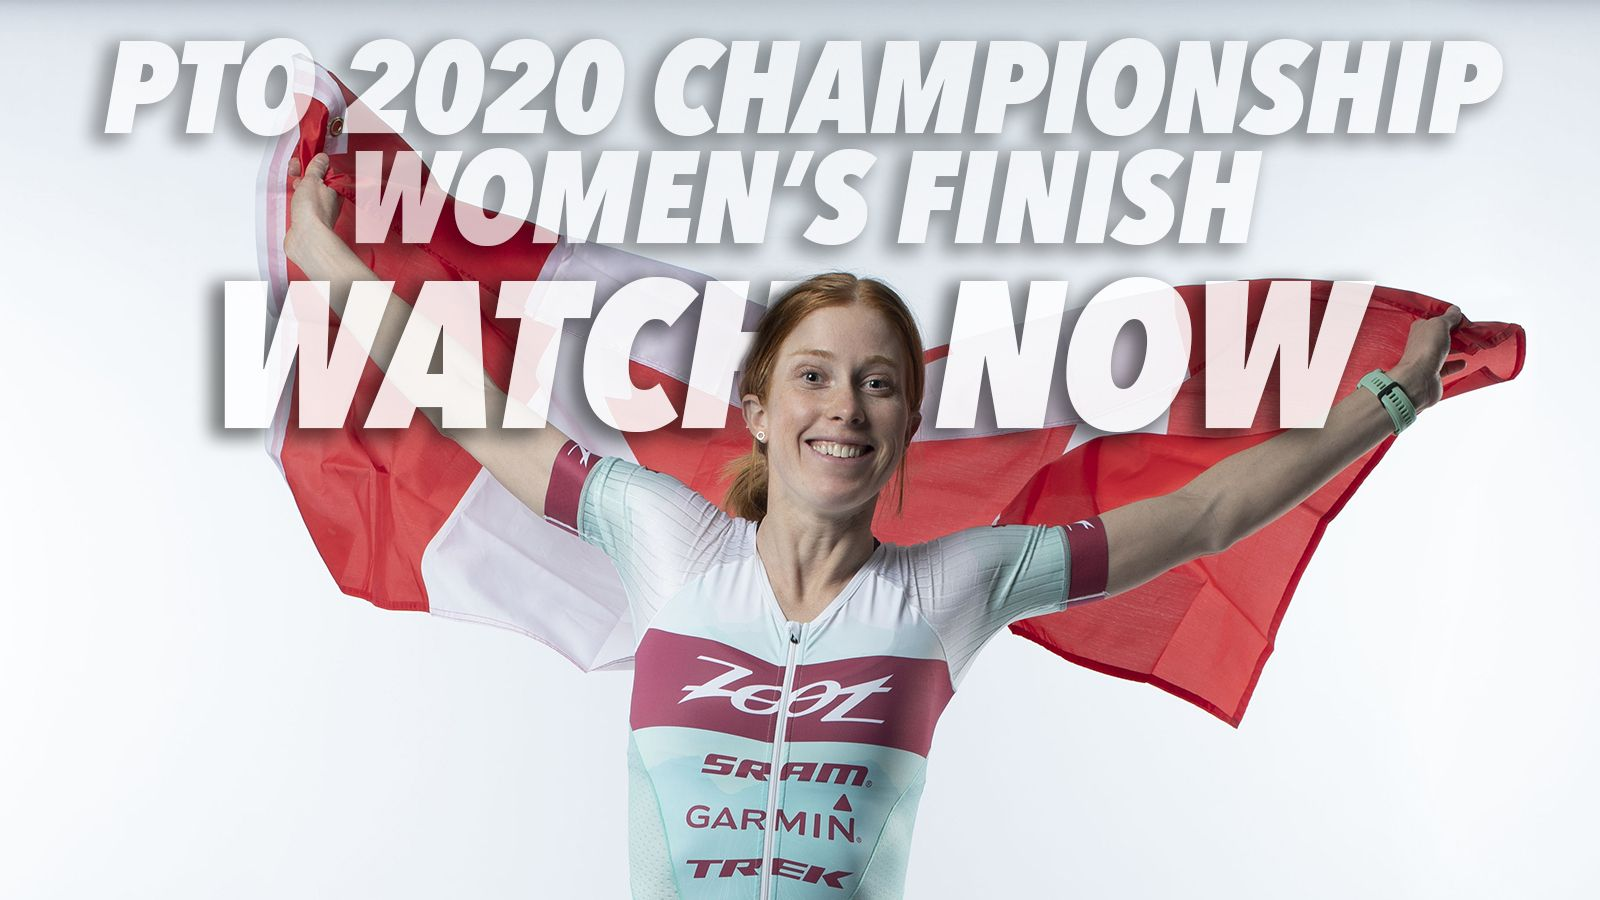 Women's Race Finish